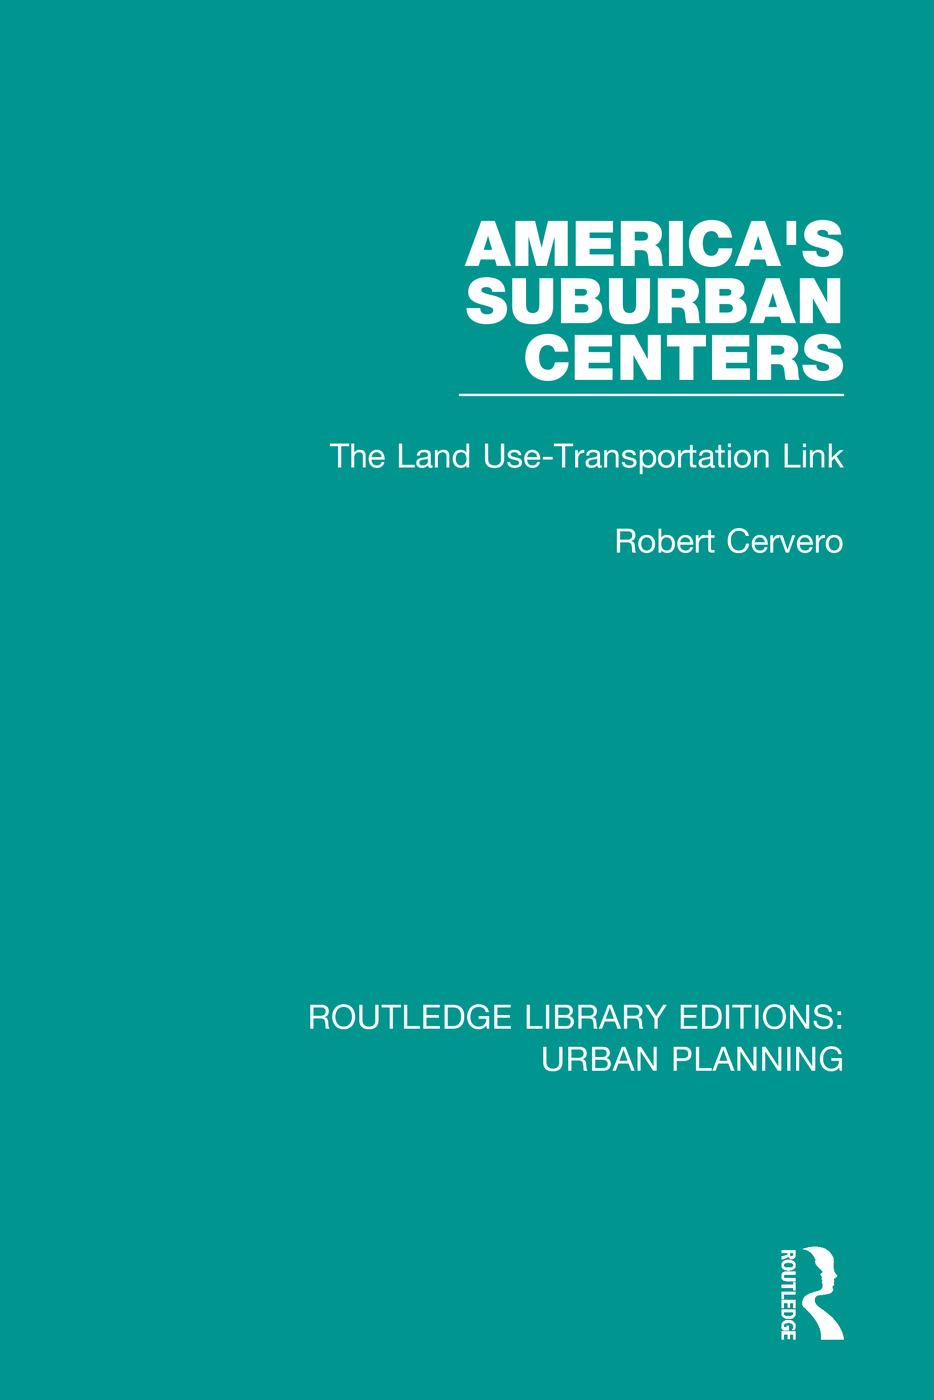 America's Suburban Centers